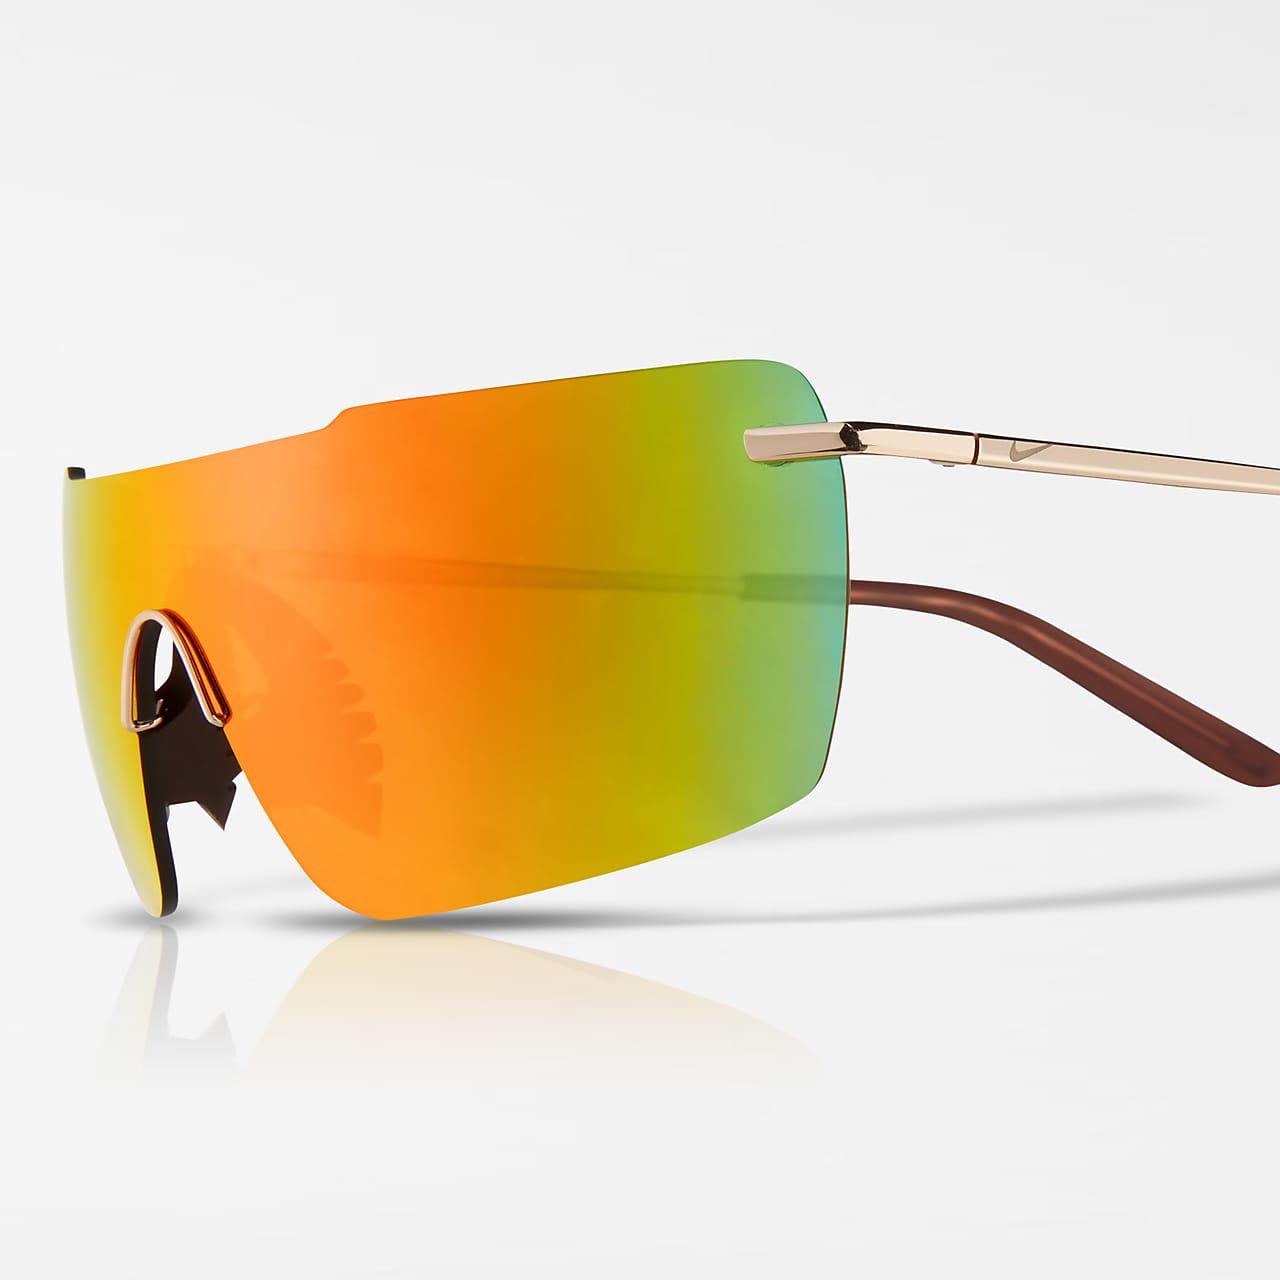 Nike Meridian Mirrored Sunglasses